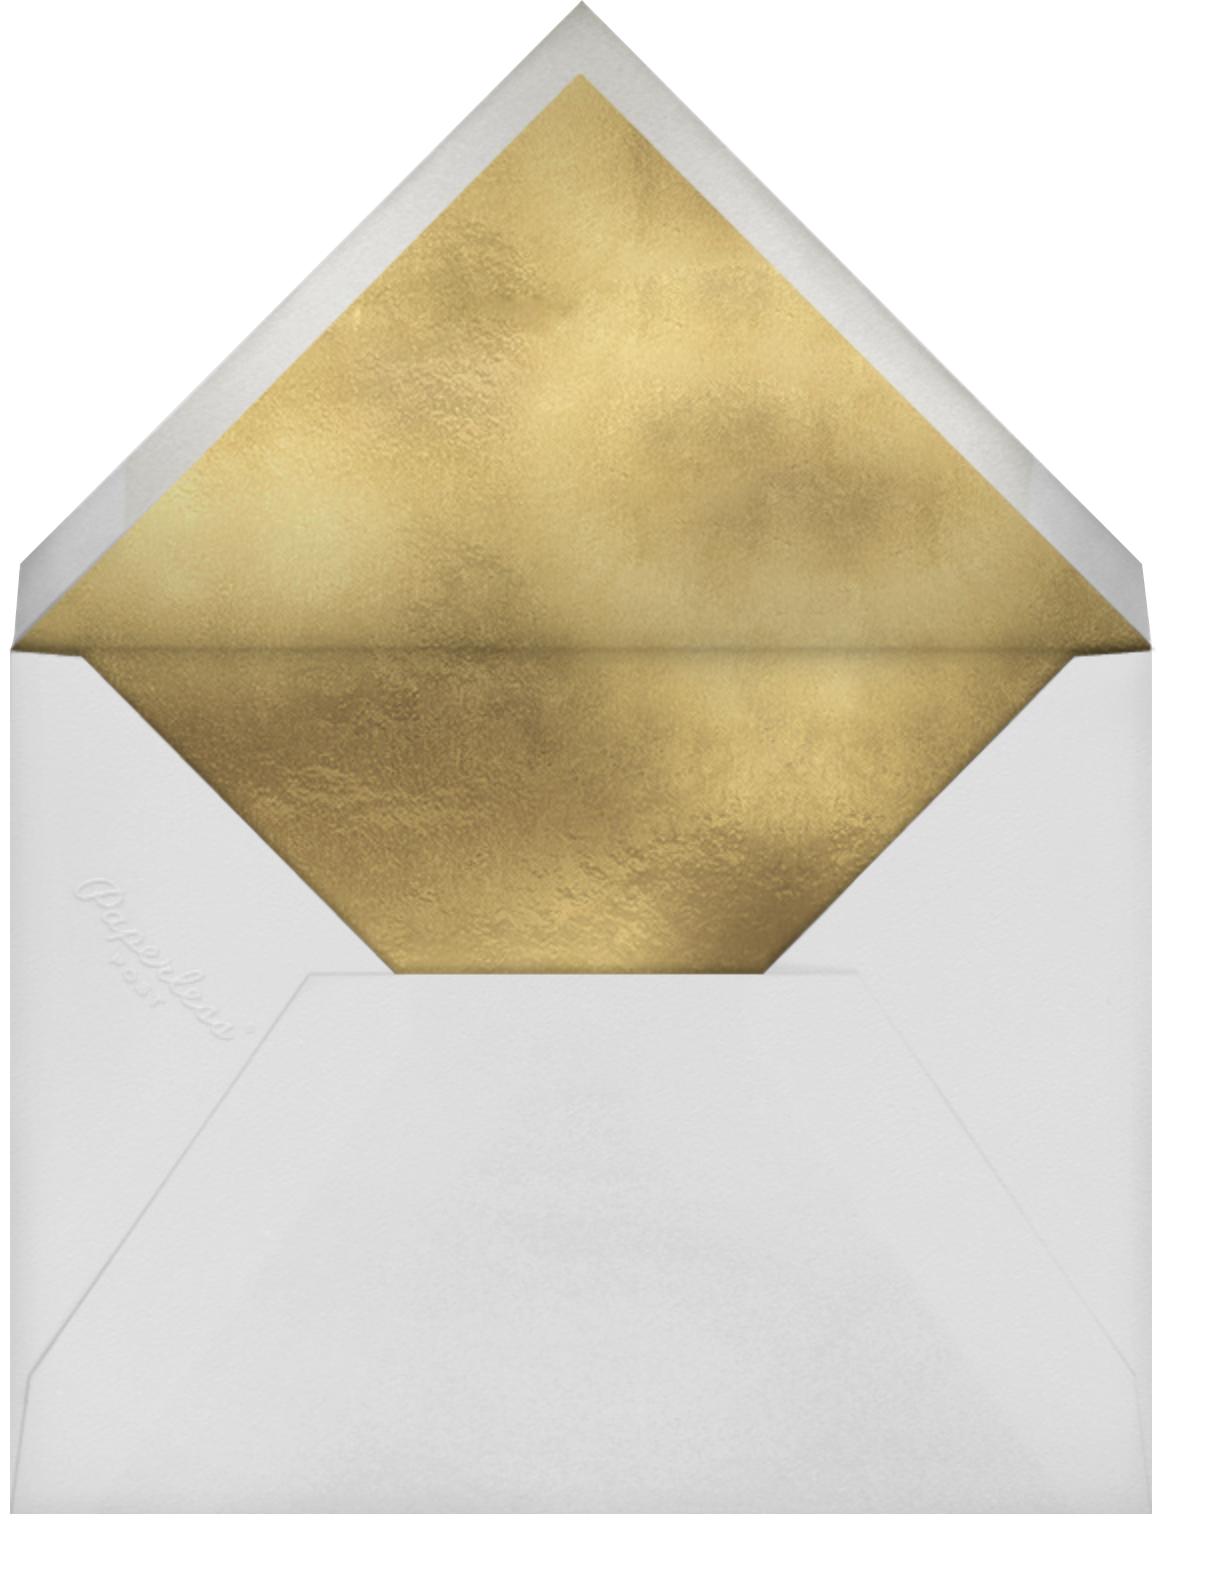 Ranunculus - Gold - Paperless Post - Memorial service - envelope back